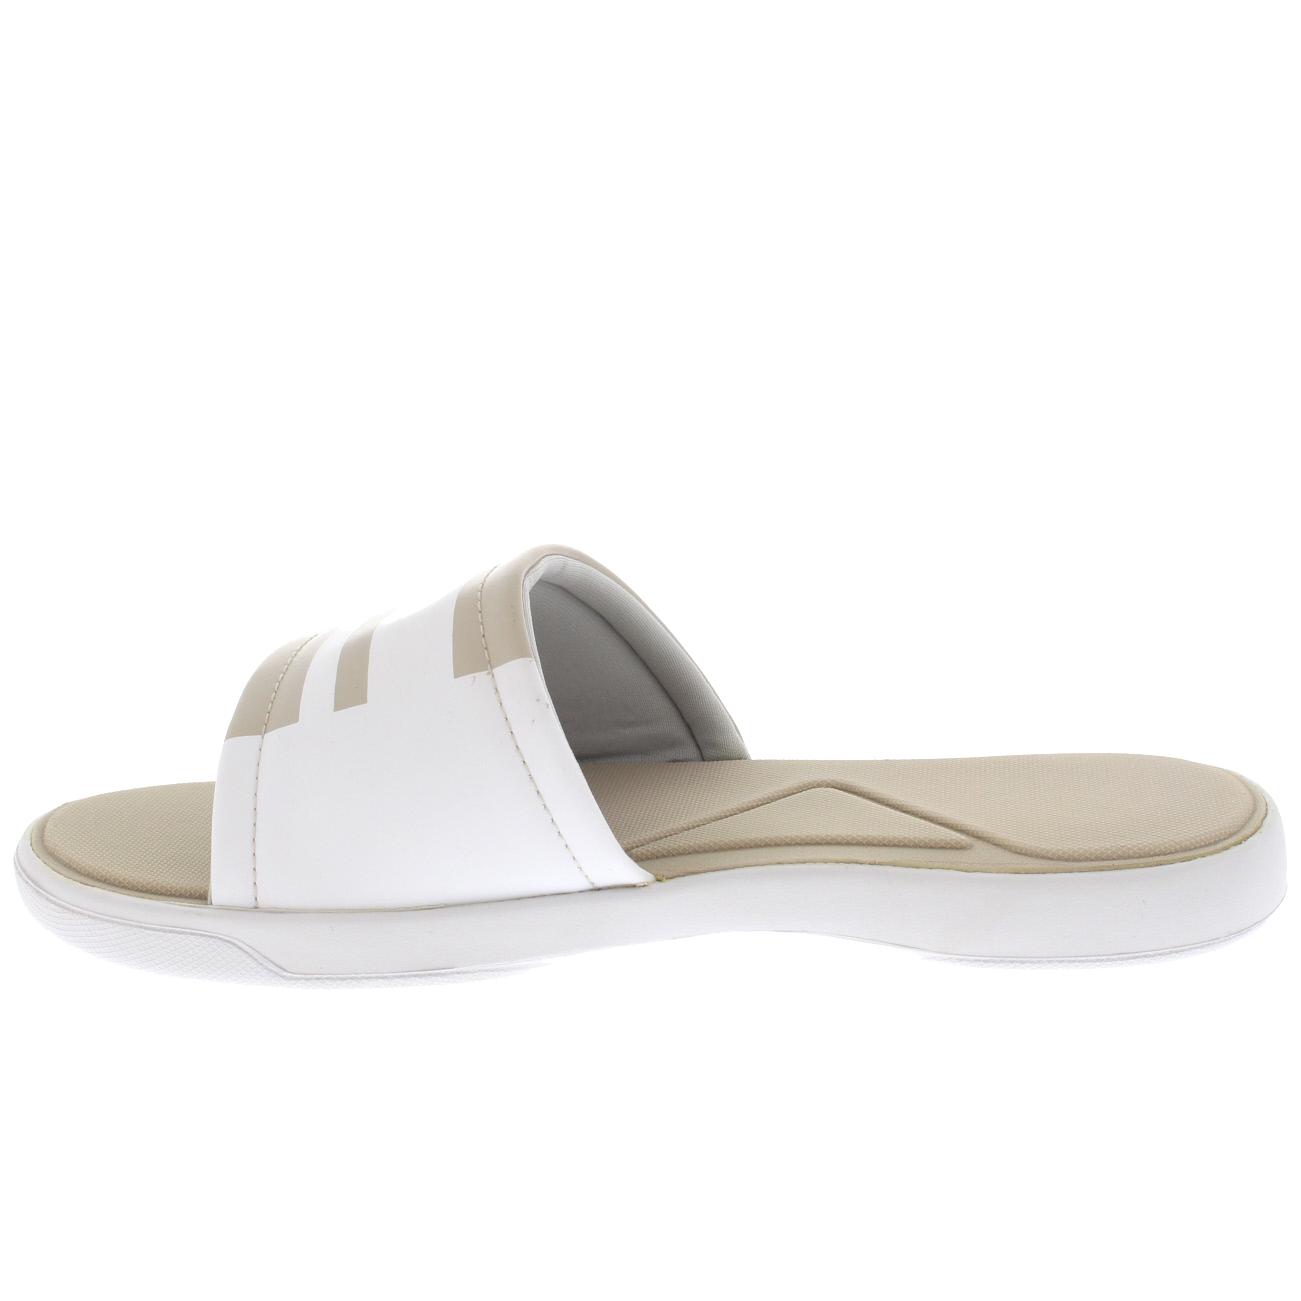 cc7eba3bb Ladies Lacoste L.30 Slide 317 1 Sports Lightweight Sliders Sandals ...